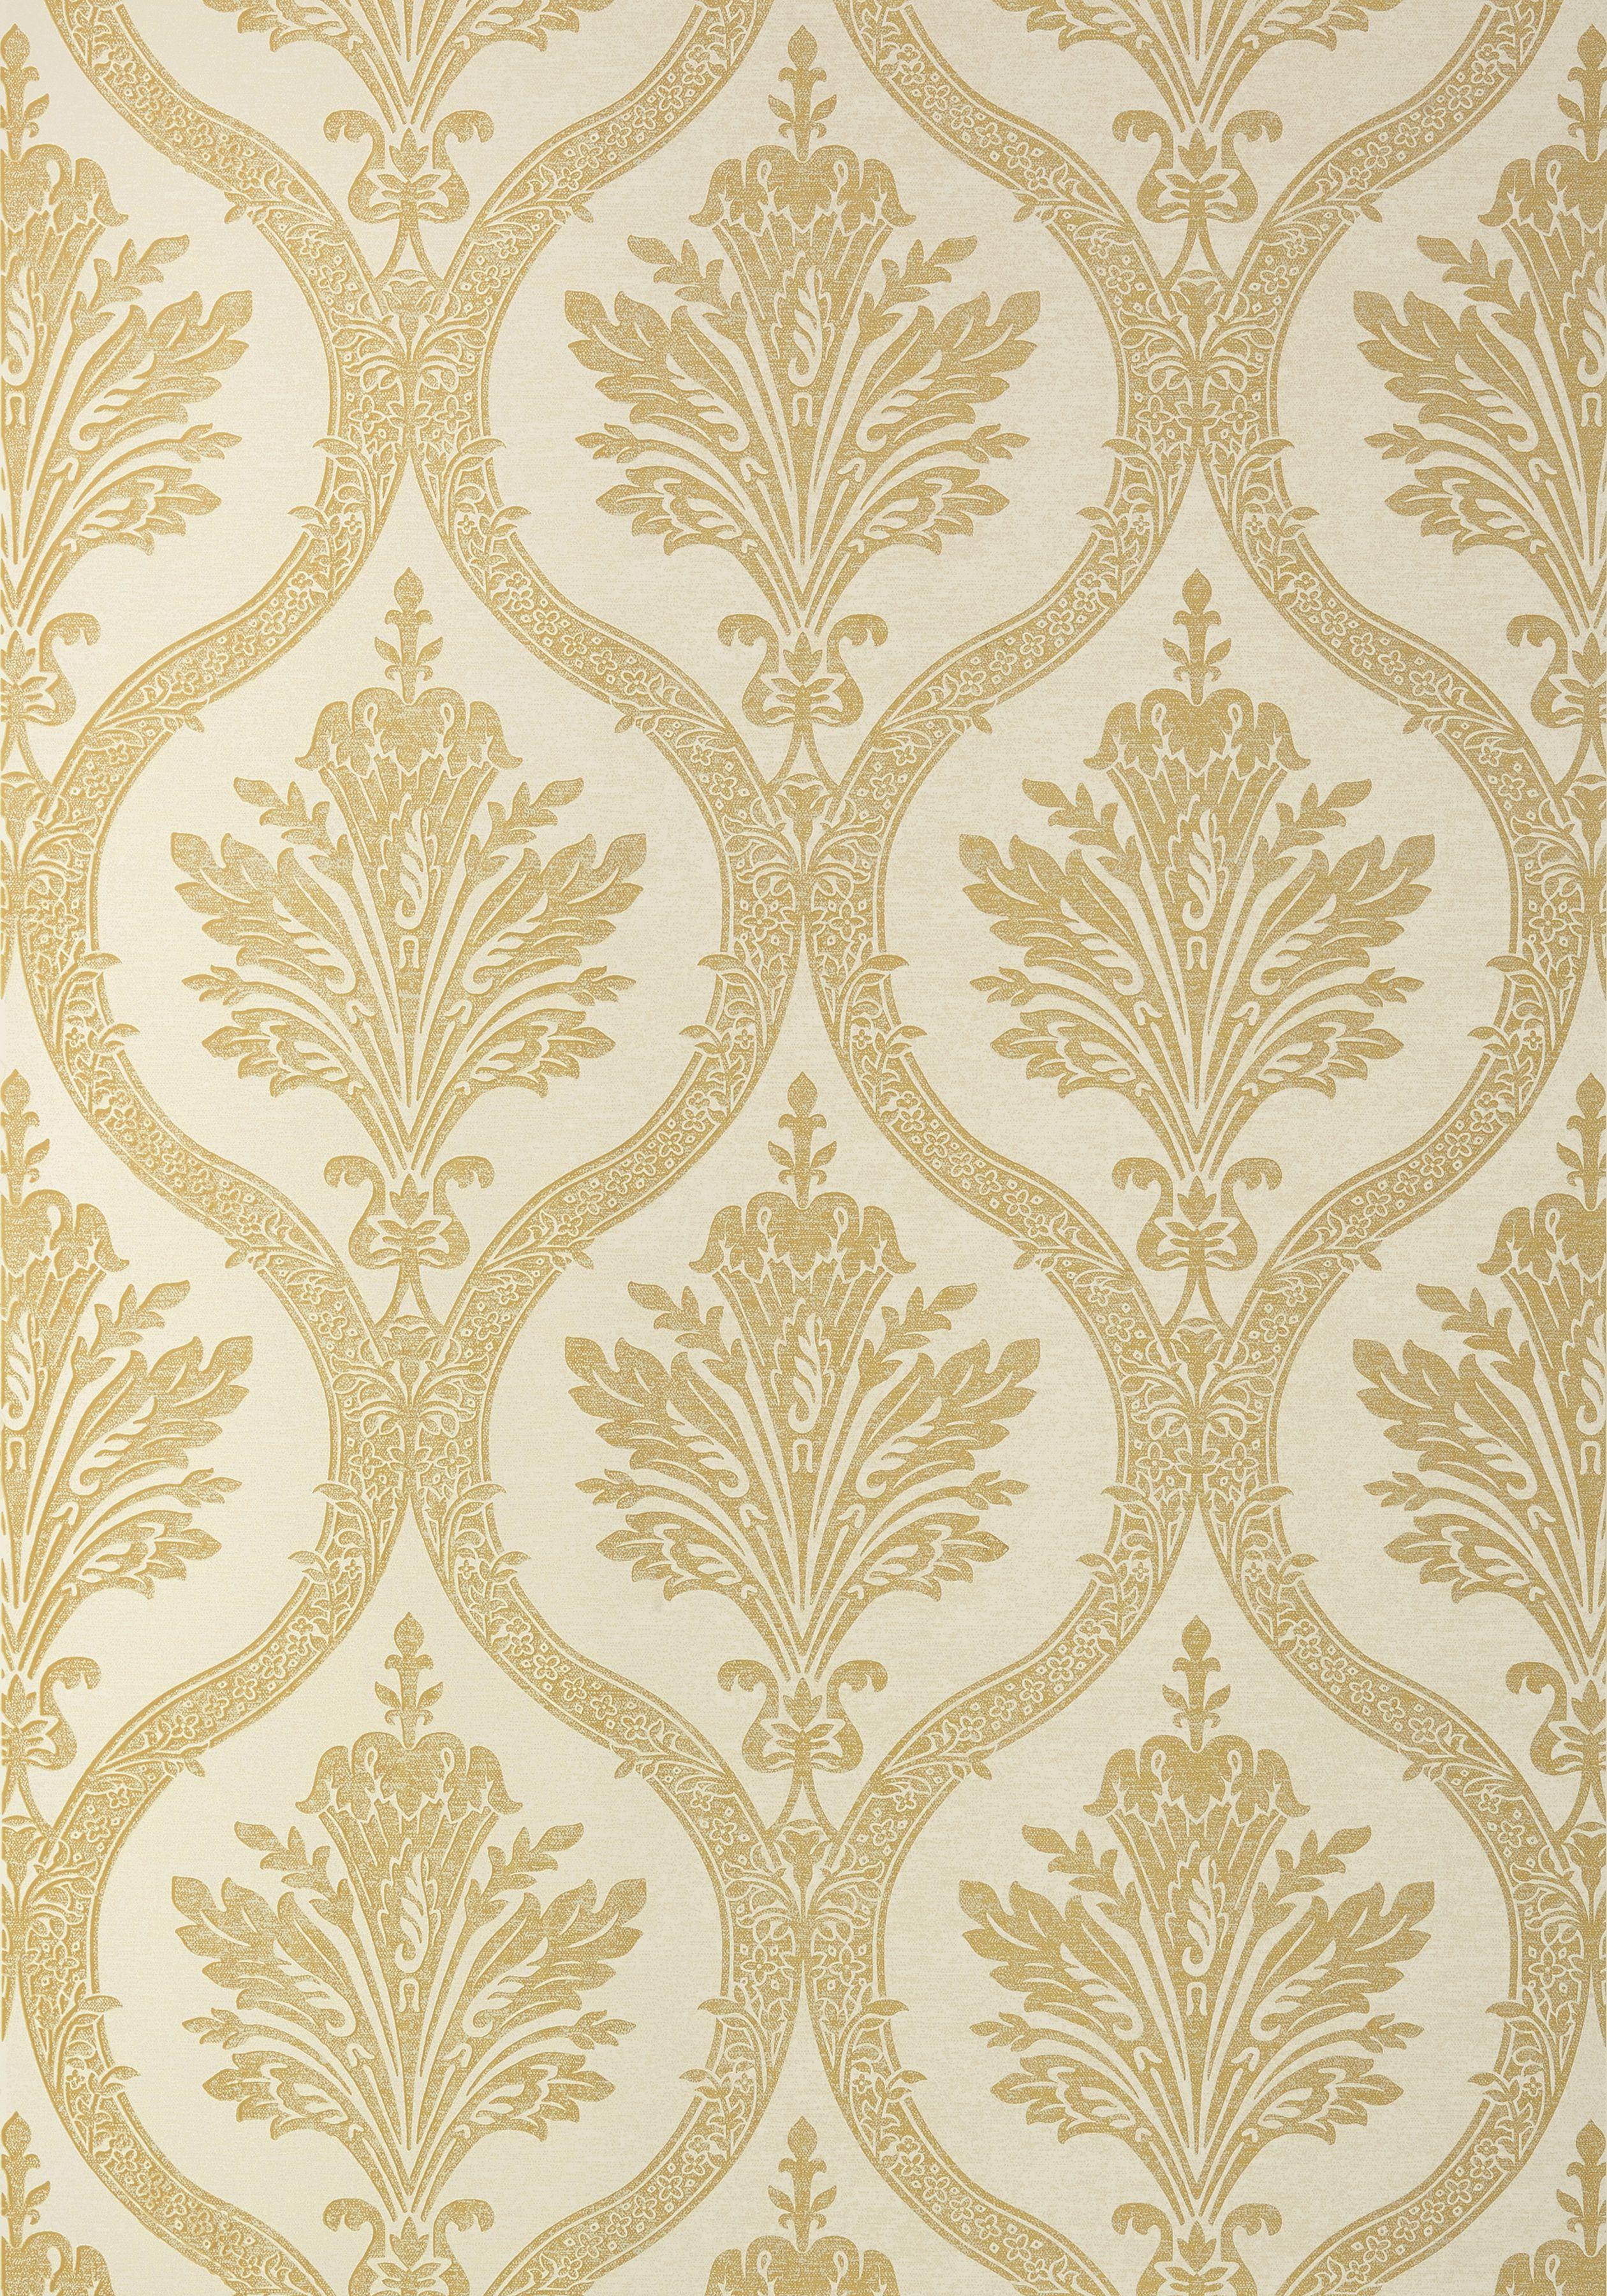 CLESSIDRA, Metallic Gold on Cream, T89159, Collection